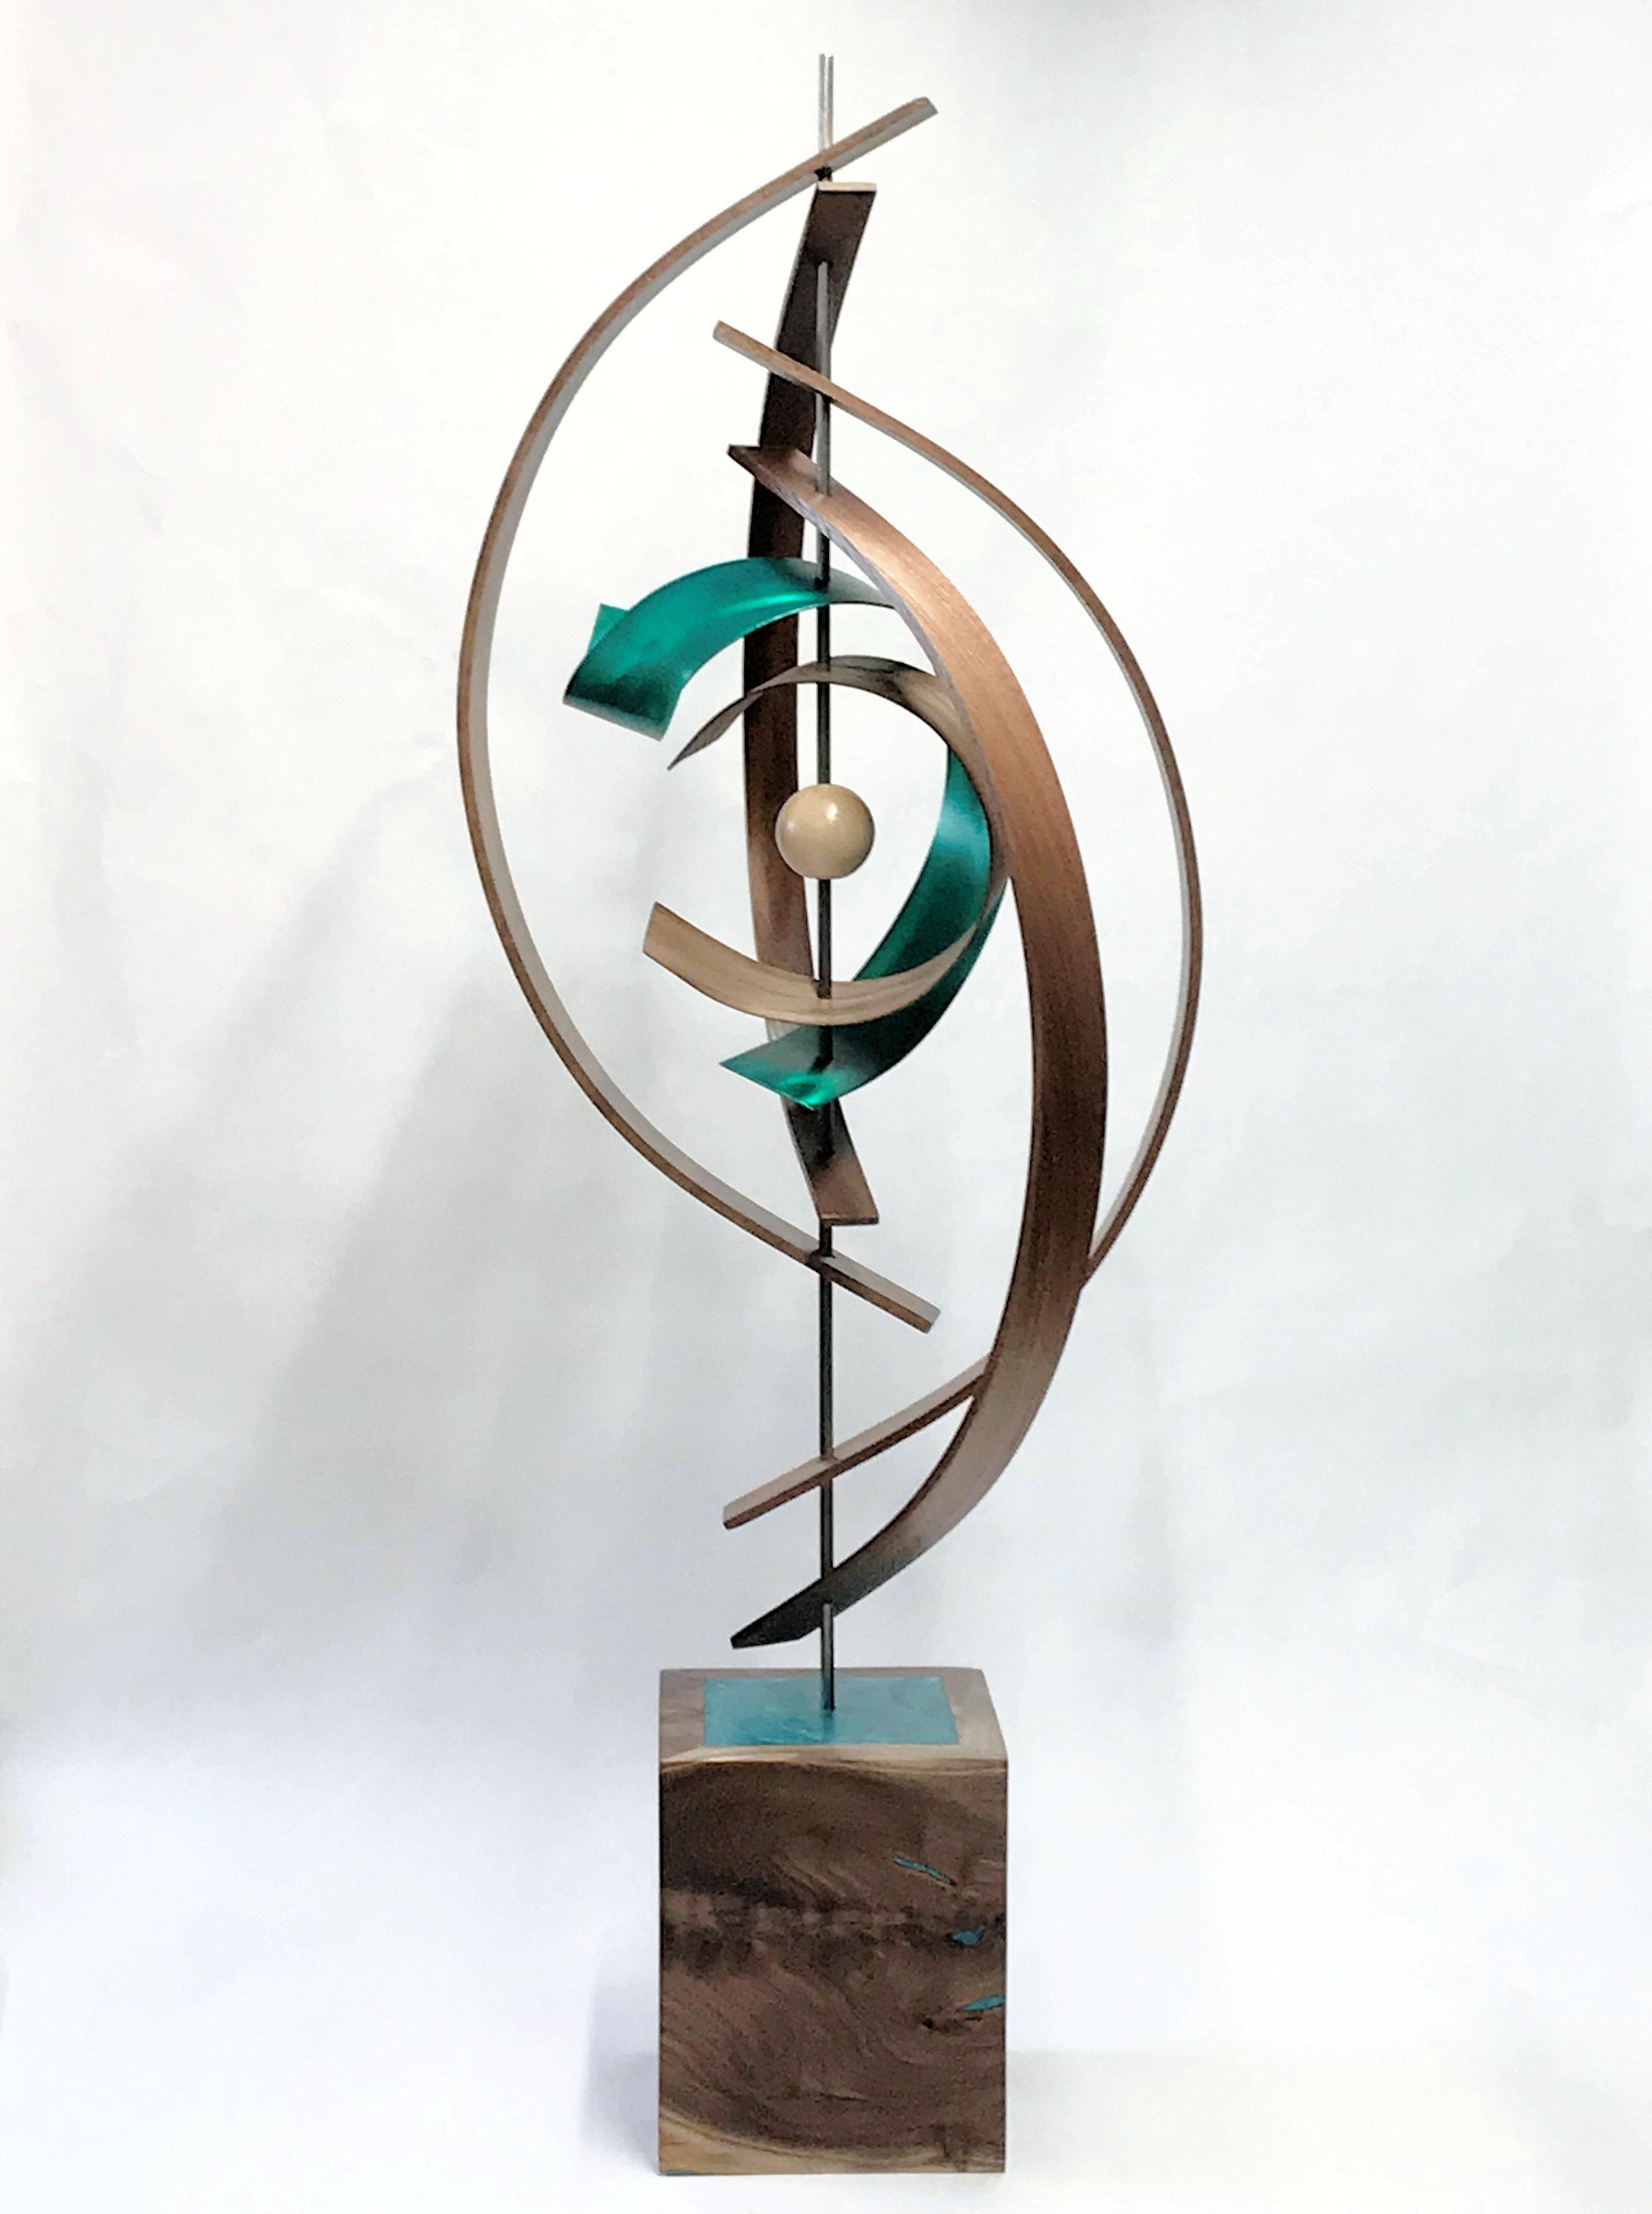 Mid-Century Modern Inspired, Wood Metal Sculpture, Original Contemporary Art